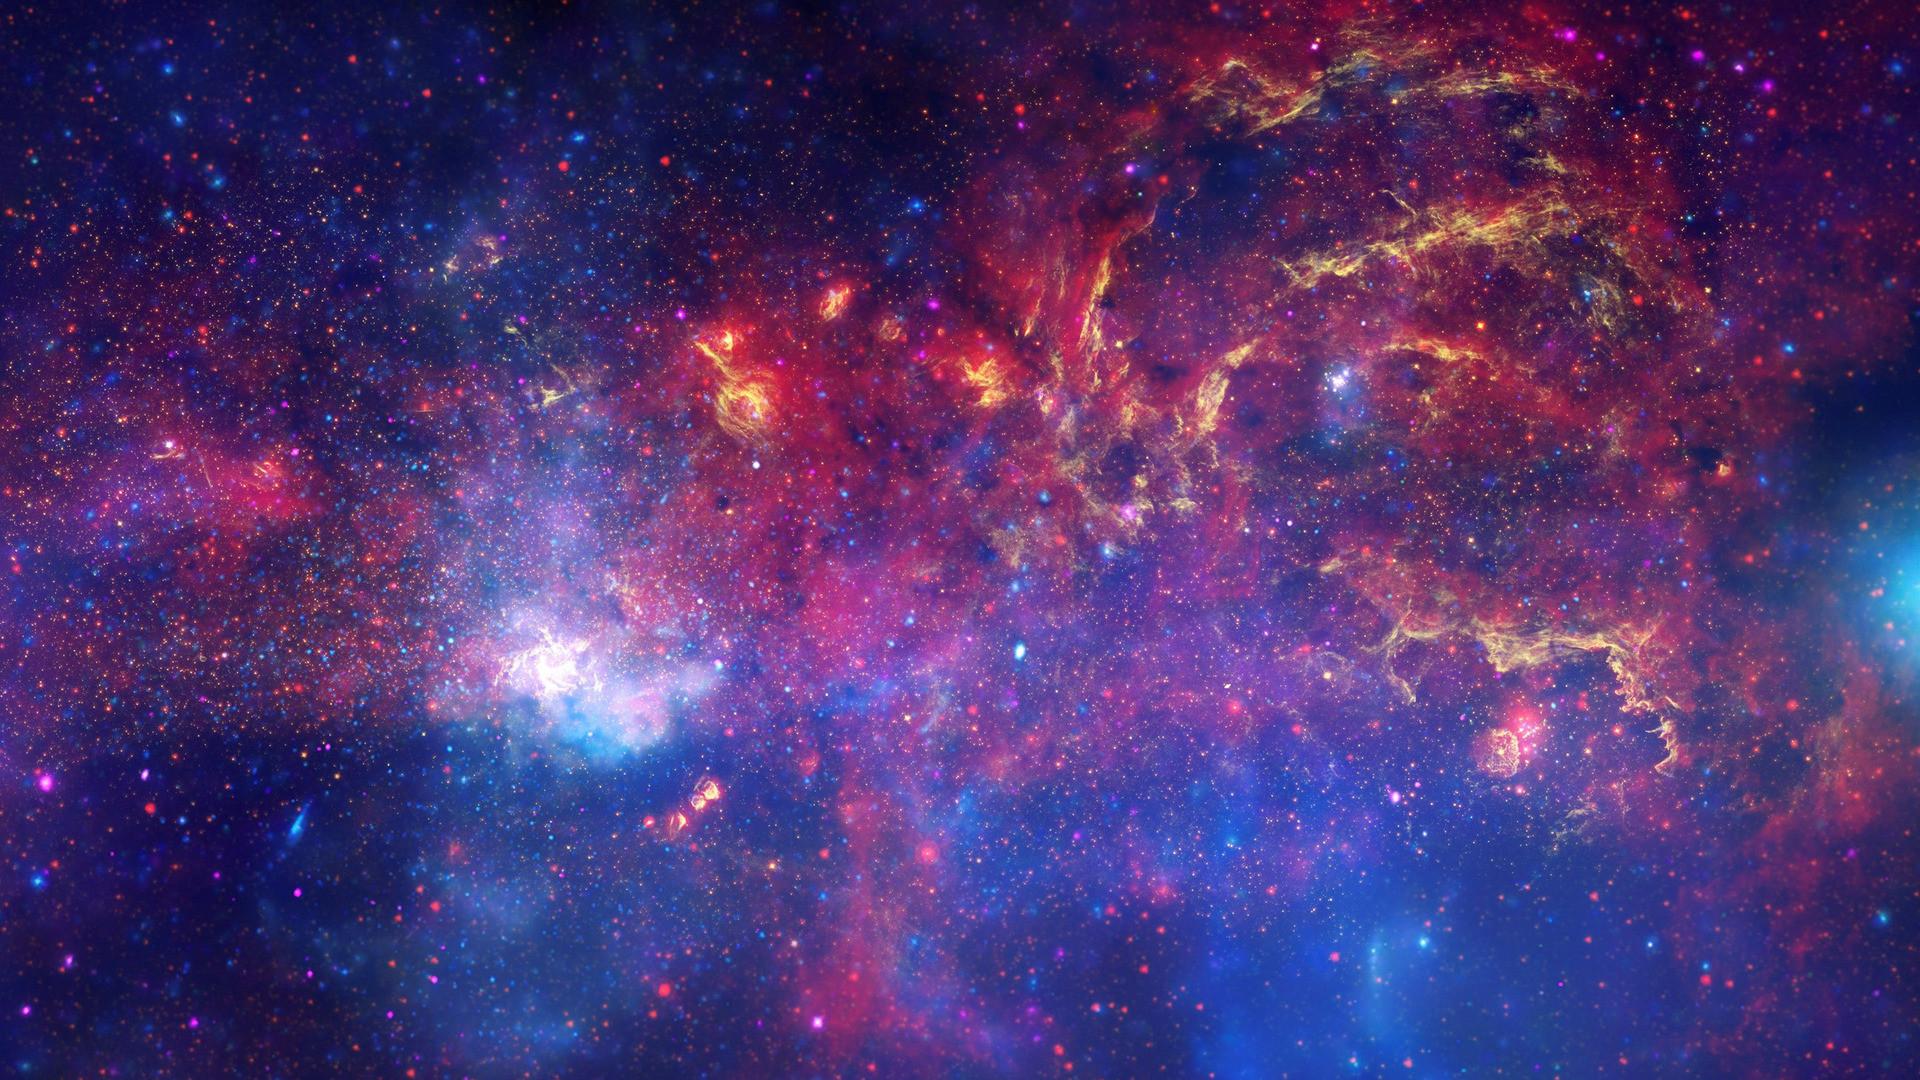 Amazing Space Galaxy Background 1080p.